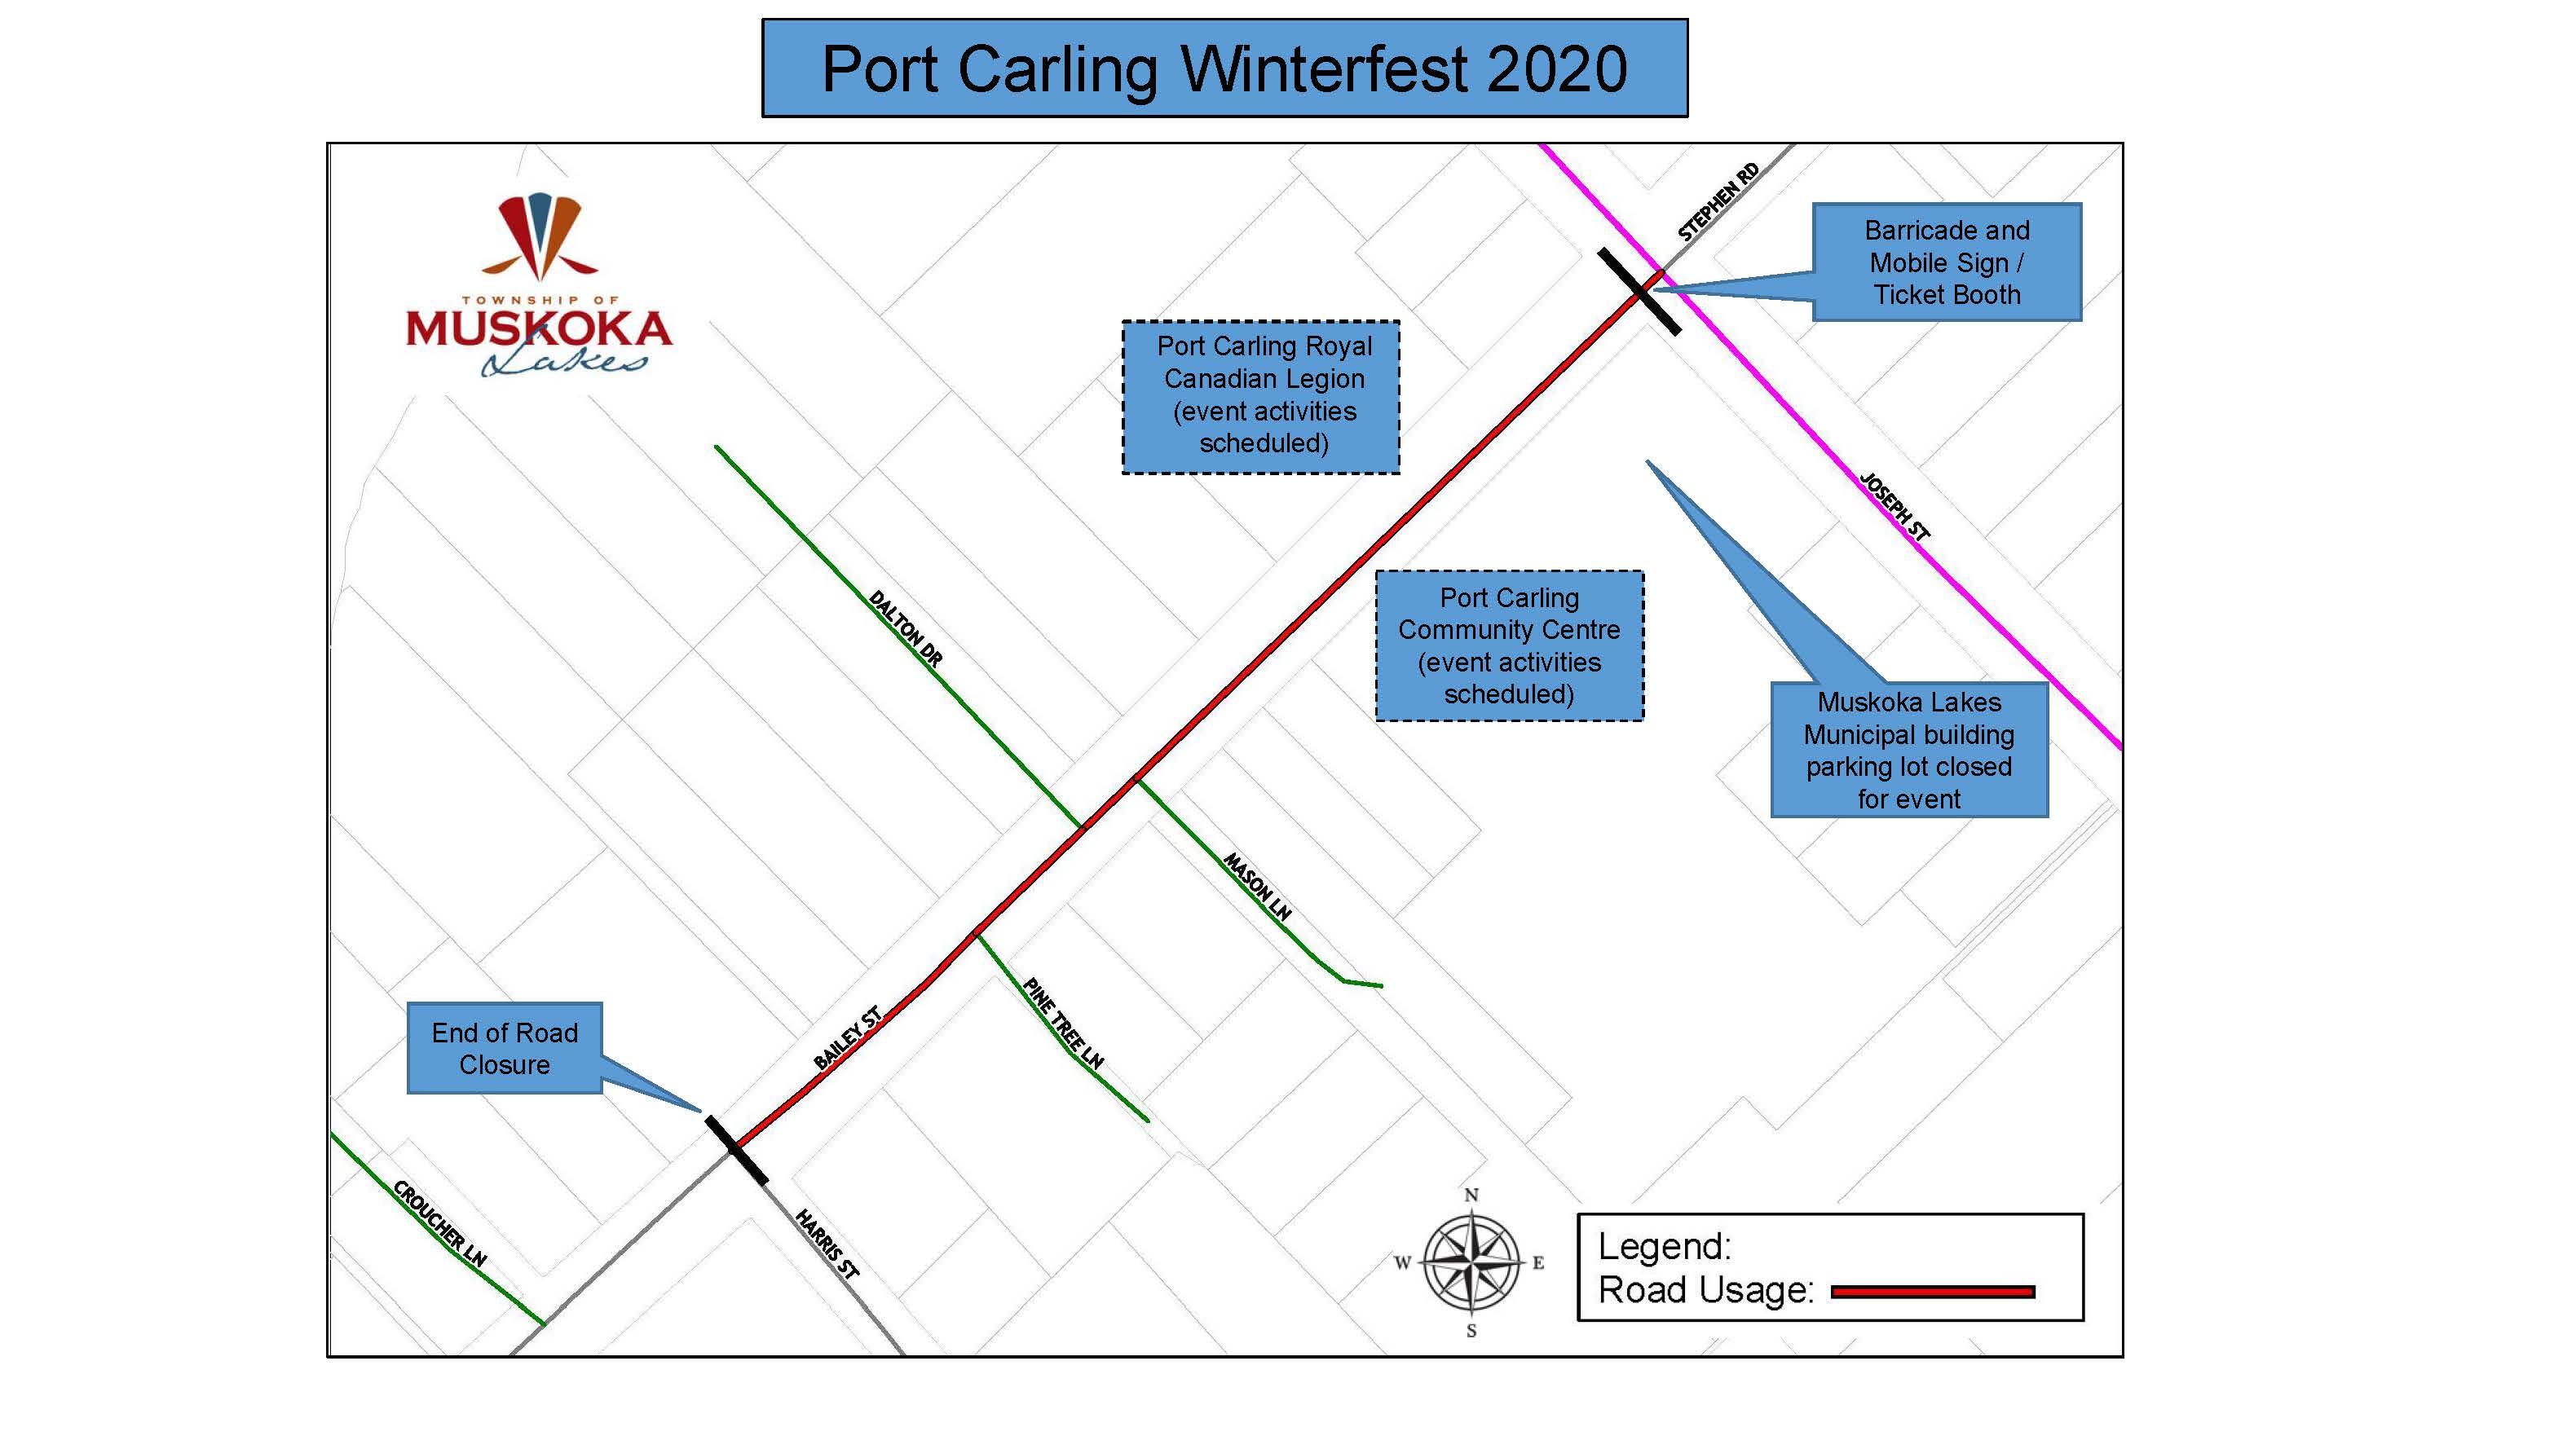 map of port carling winterfest road closure on Bailey Street from Joseph Street to Harris Street